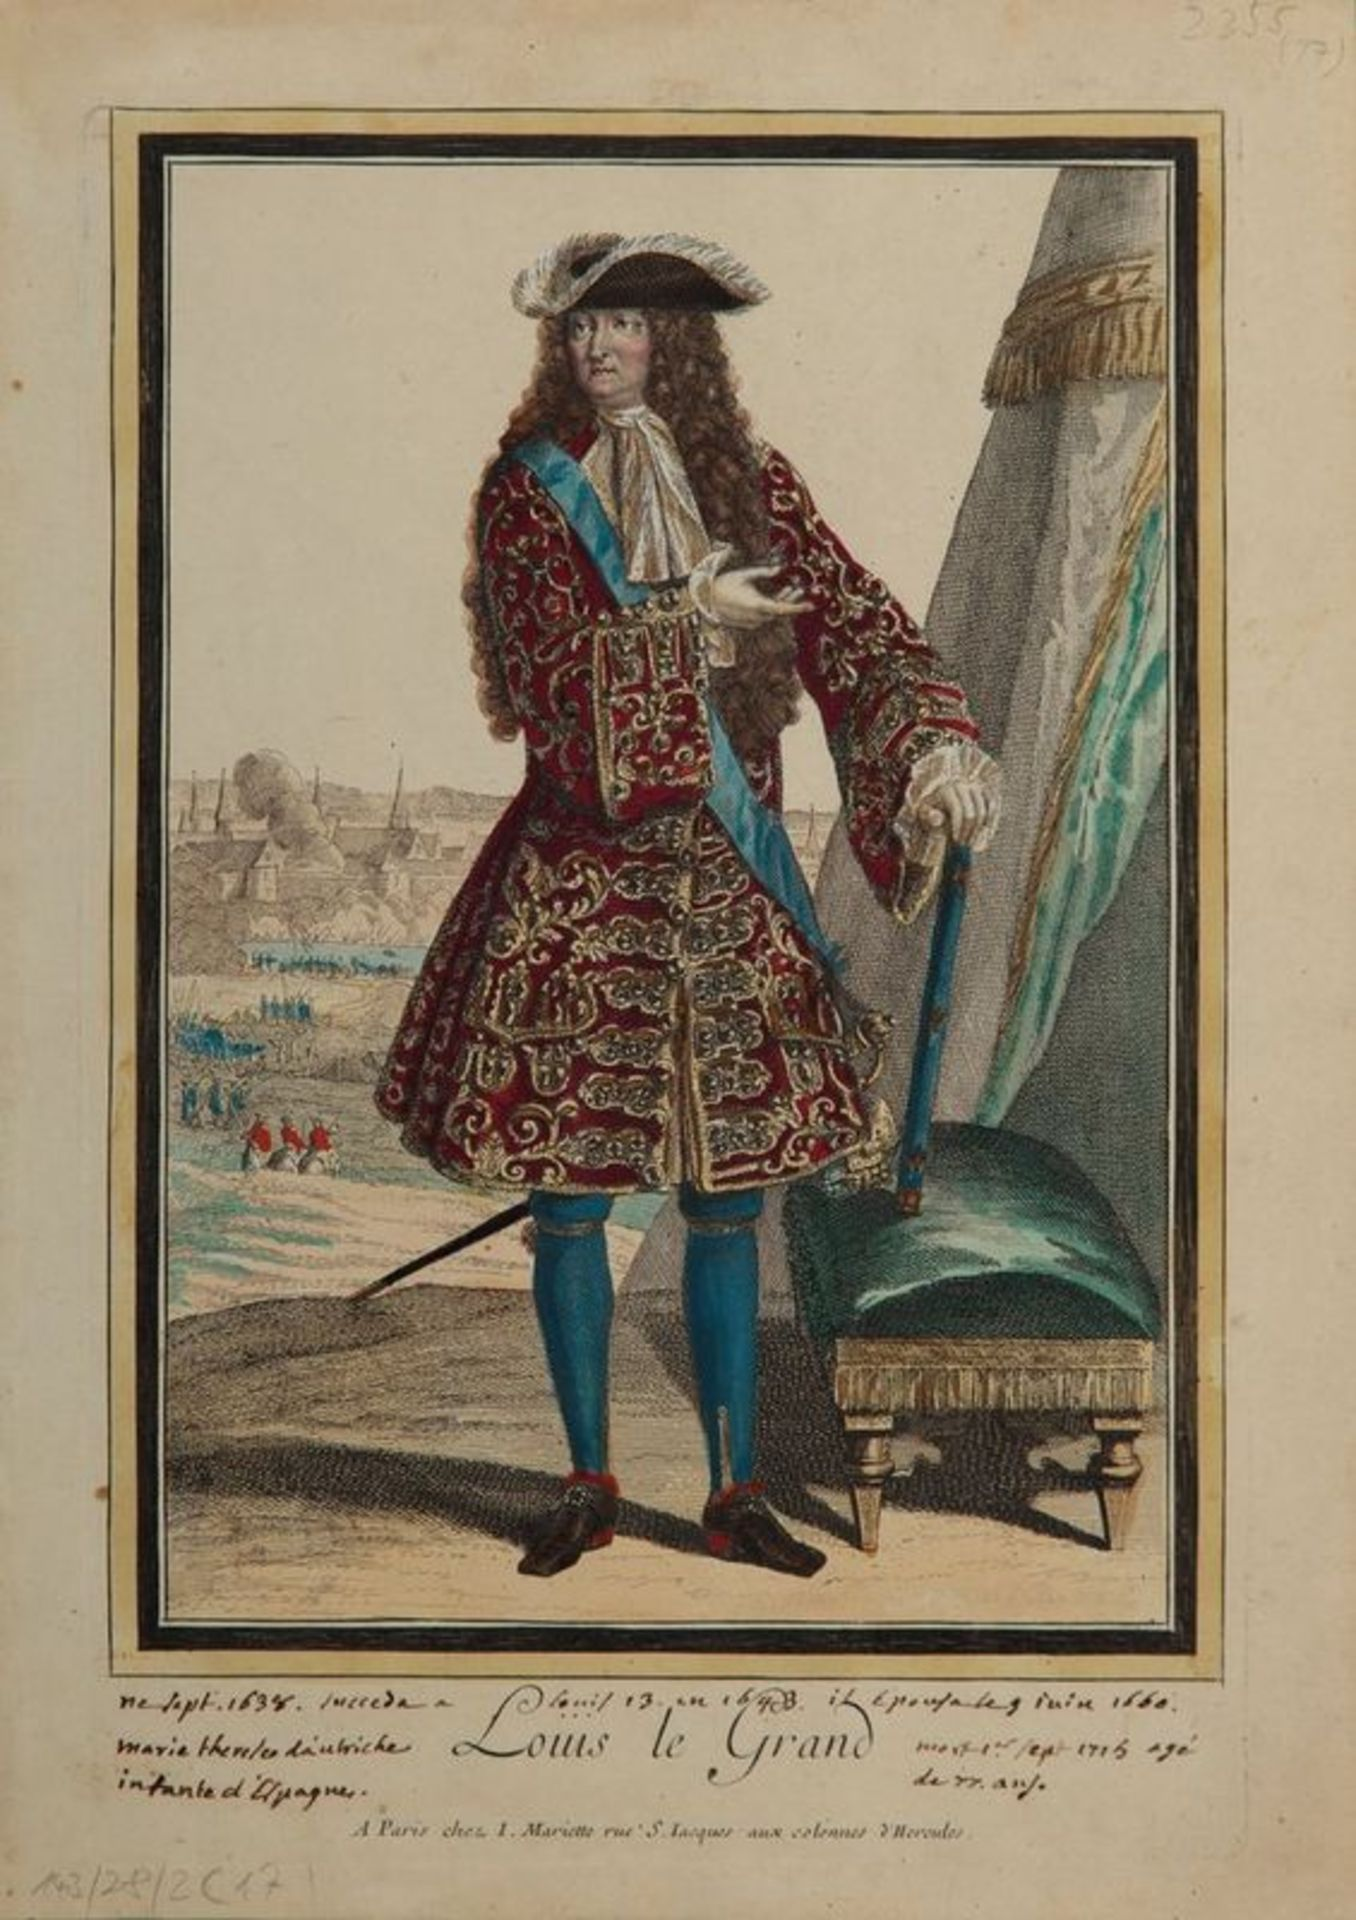 Los 575 - АRNOULT, BONNART, MARIETTE, TROUVAIN etc. Louis XIV and his family - Engraving and [...]